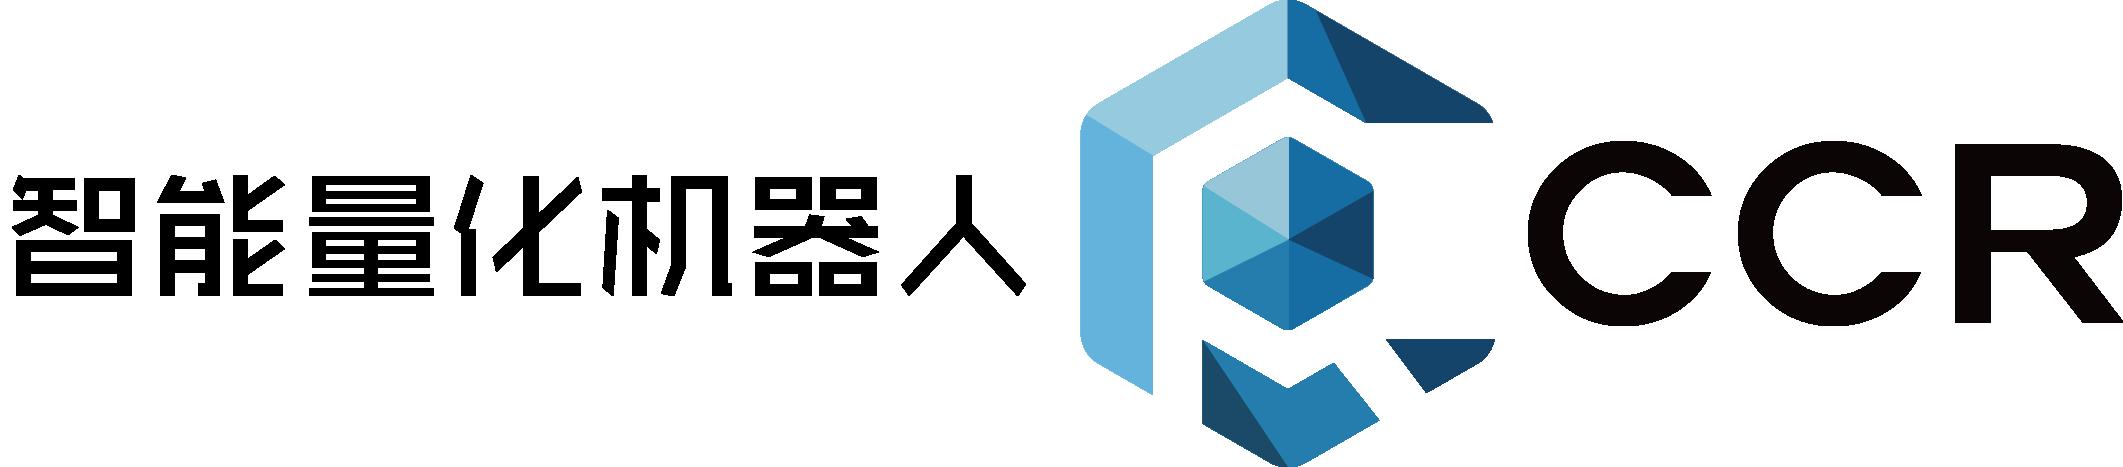 CCR自动量化机器人